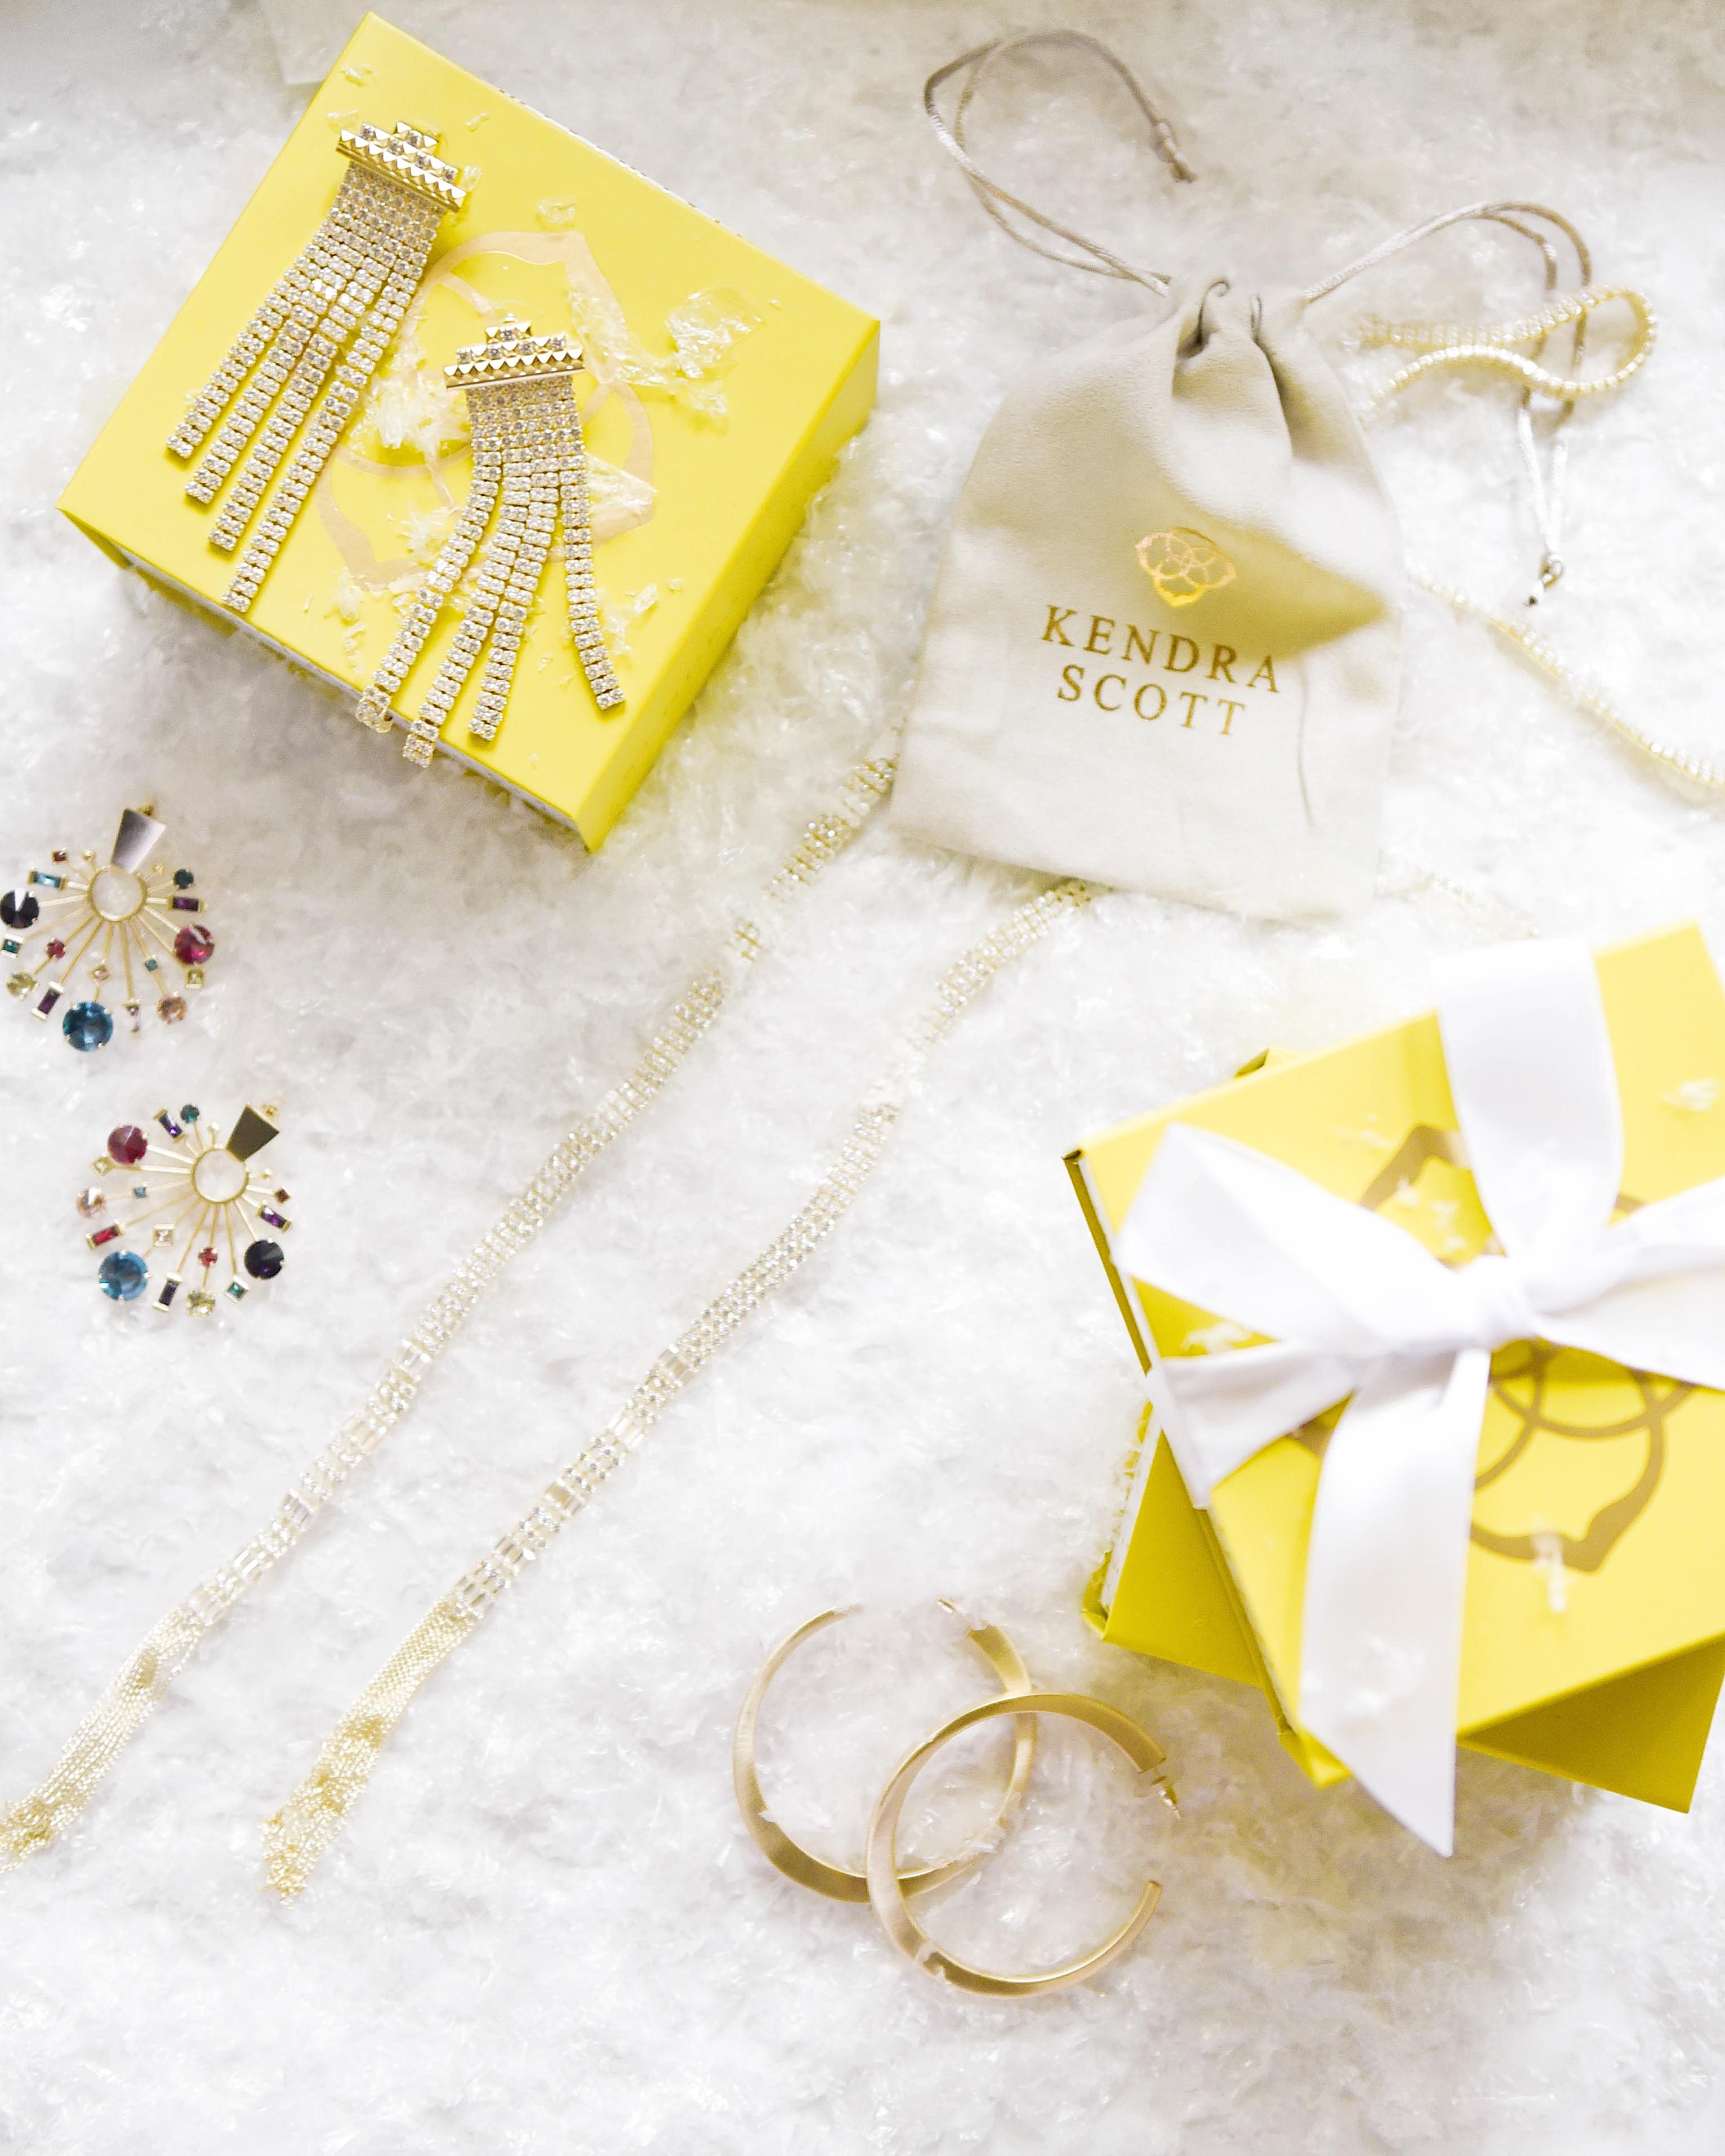 Lo-Murphy-Kendra-Scott-Gift-Assist-holiday-jewelry-gift-ideas